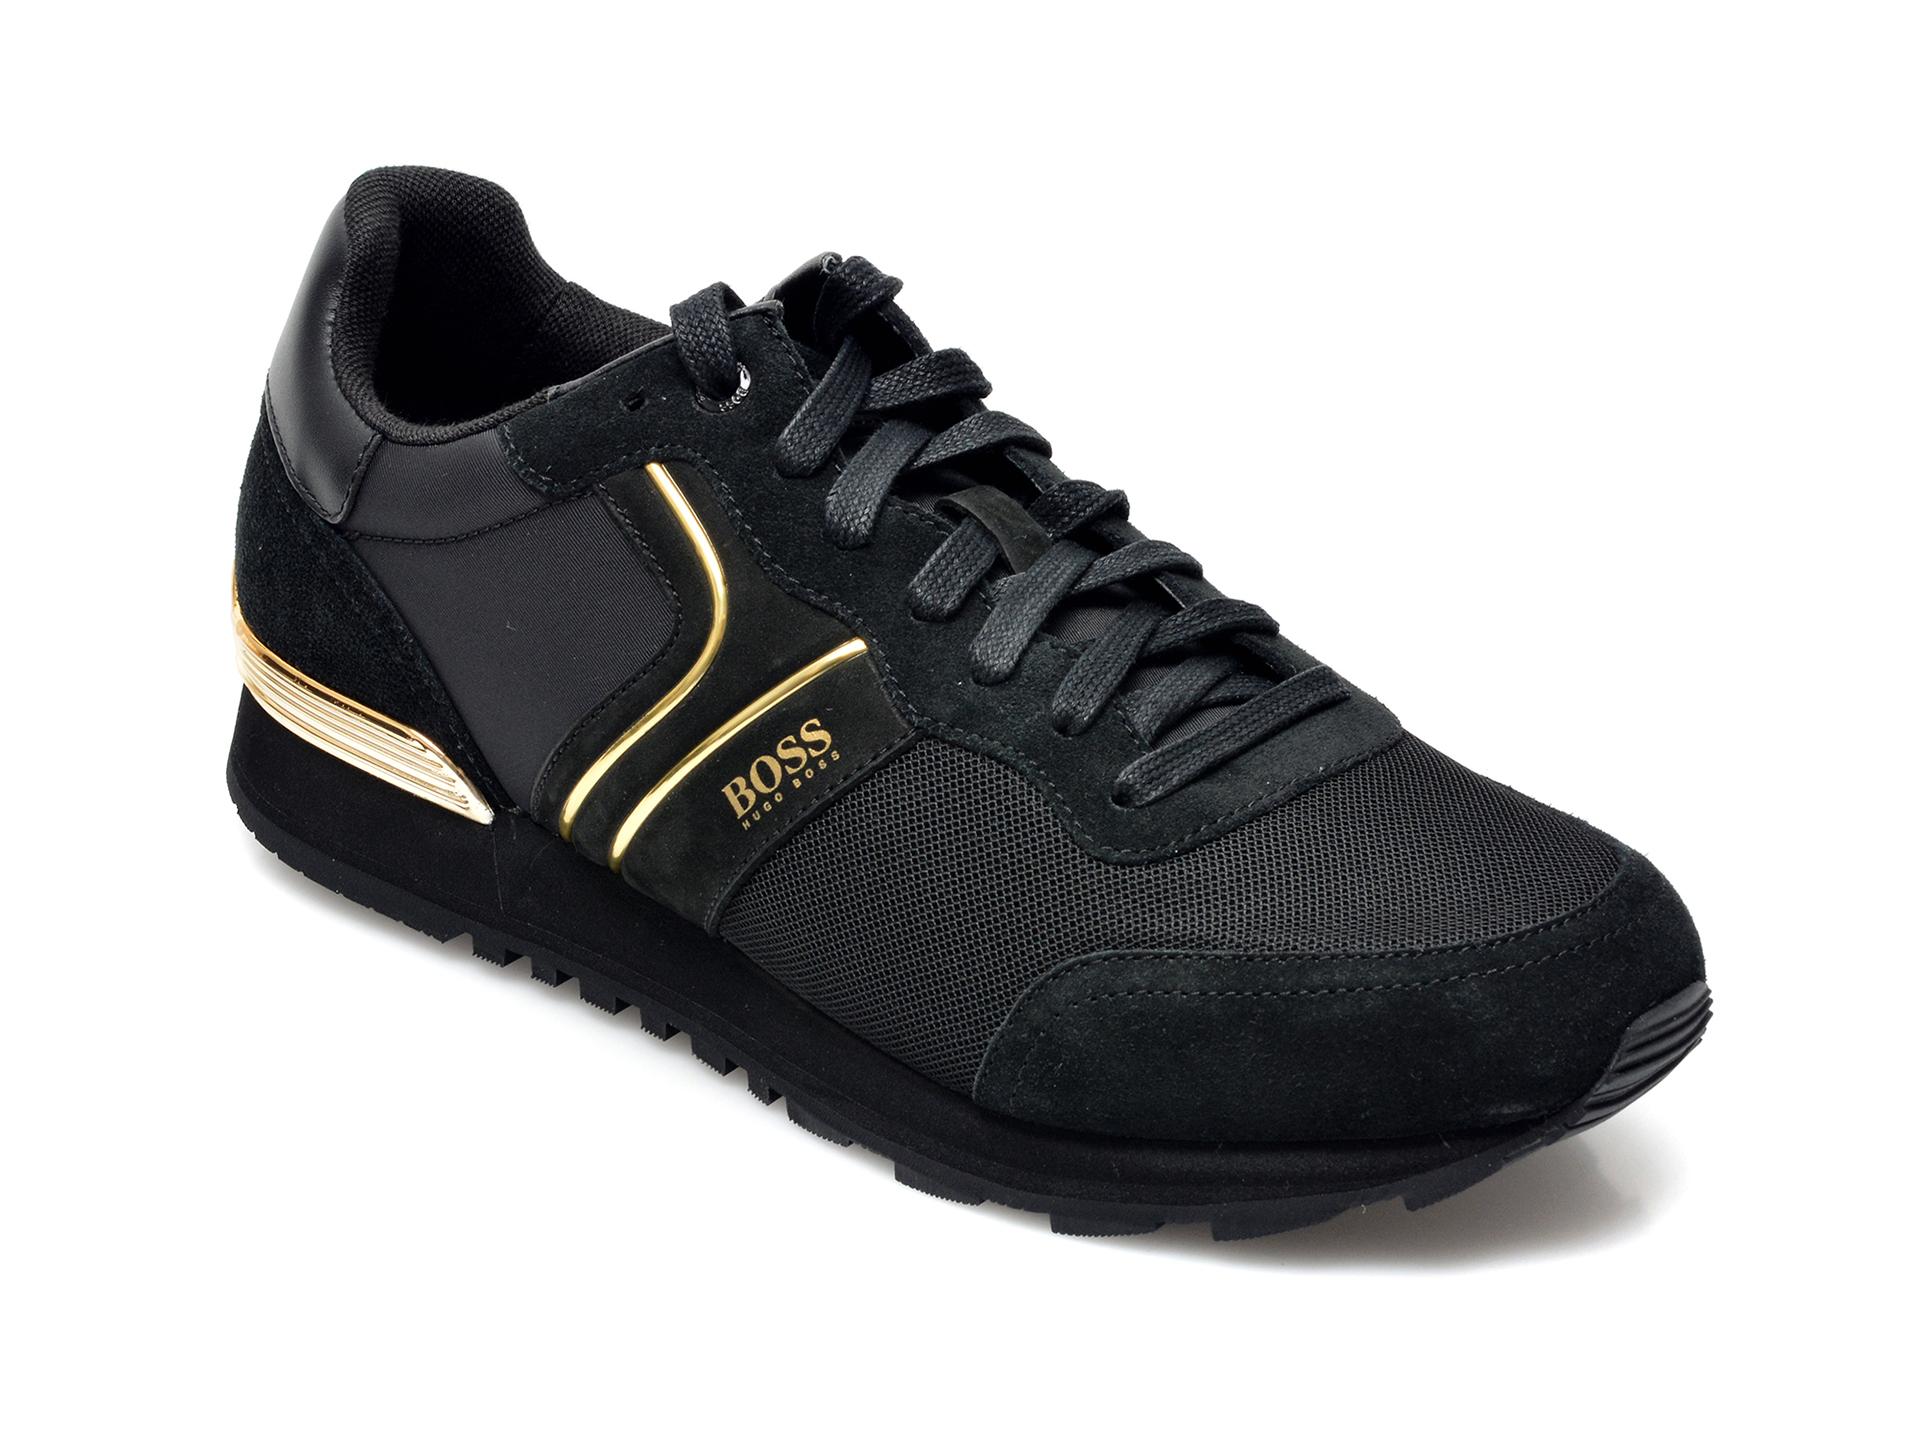 Pantofi sport HUGO BOSS negri, 3661, din material textil si piele intoarsa